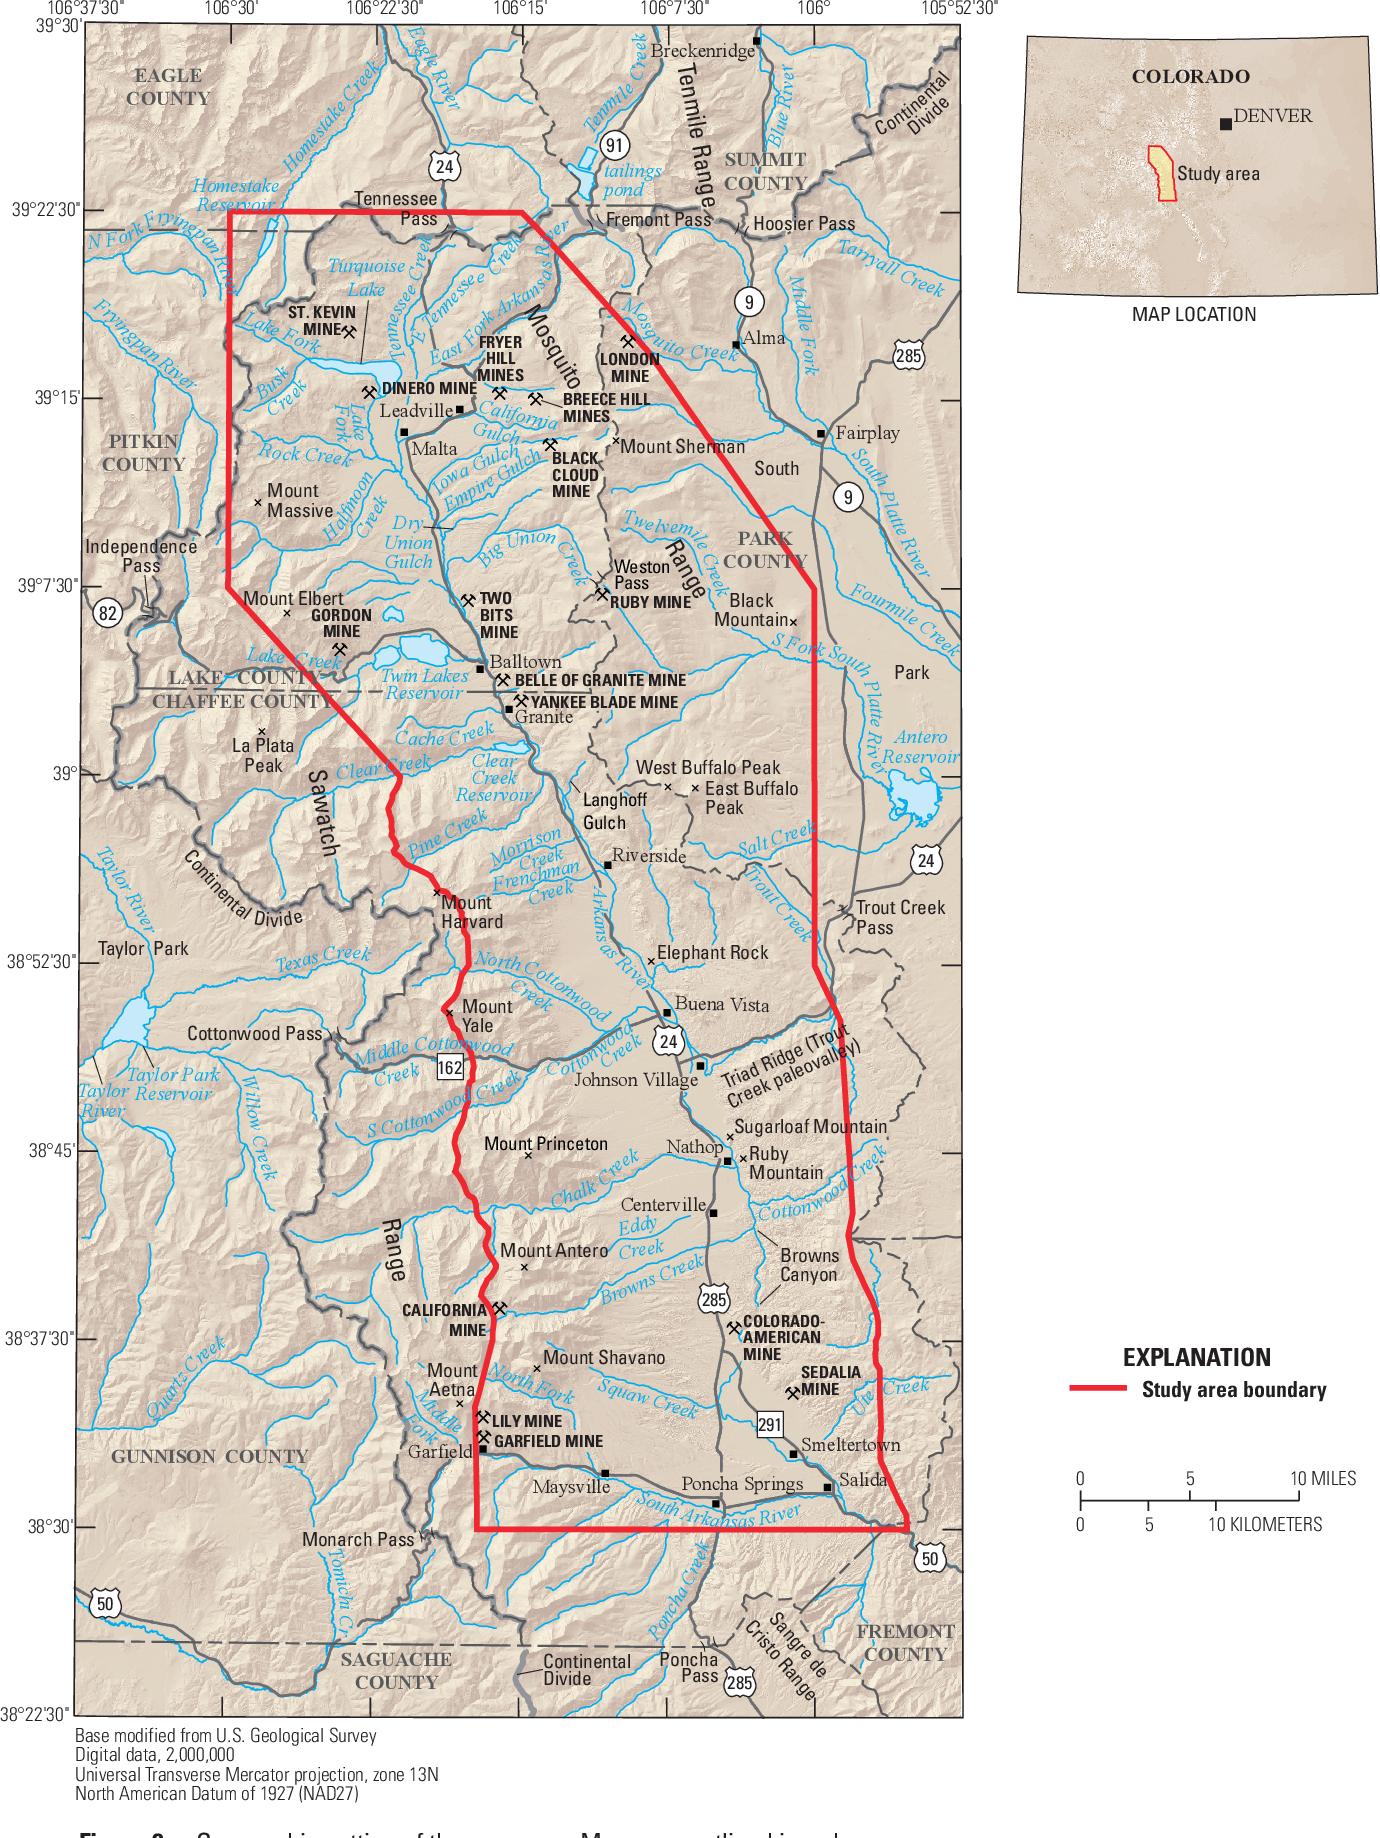 PDF] Geologic map of the upper Arkansas River valley region ...